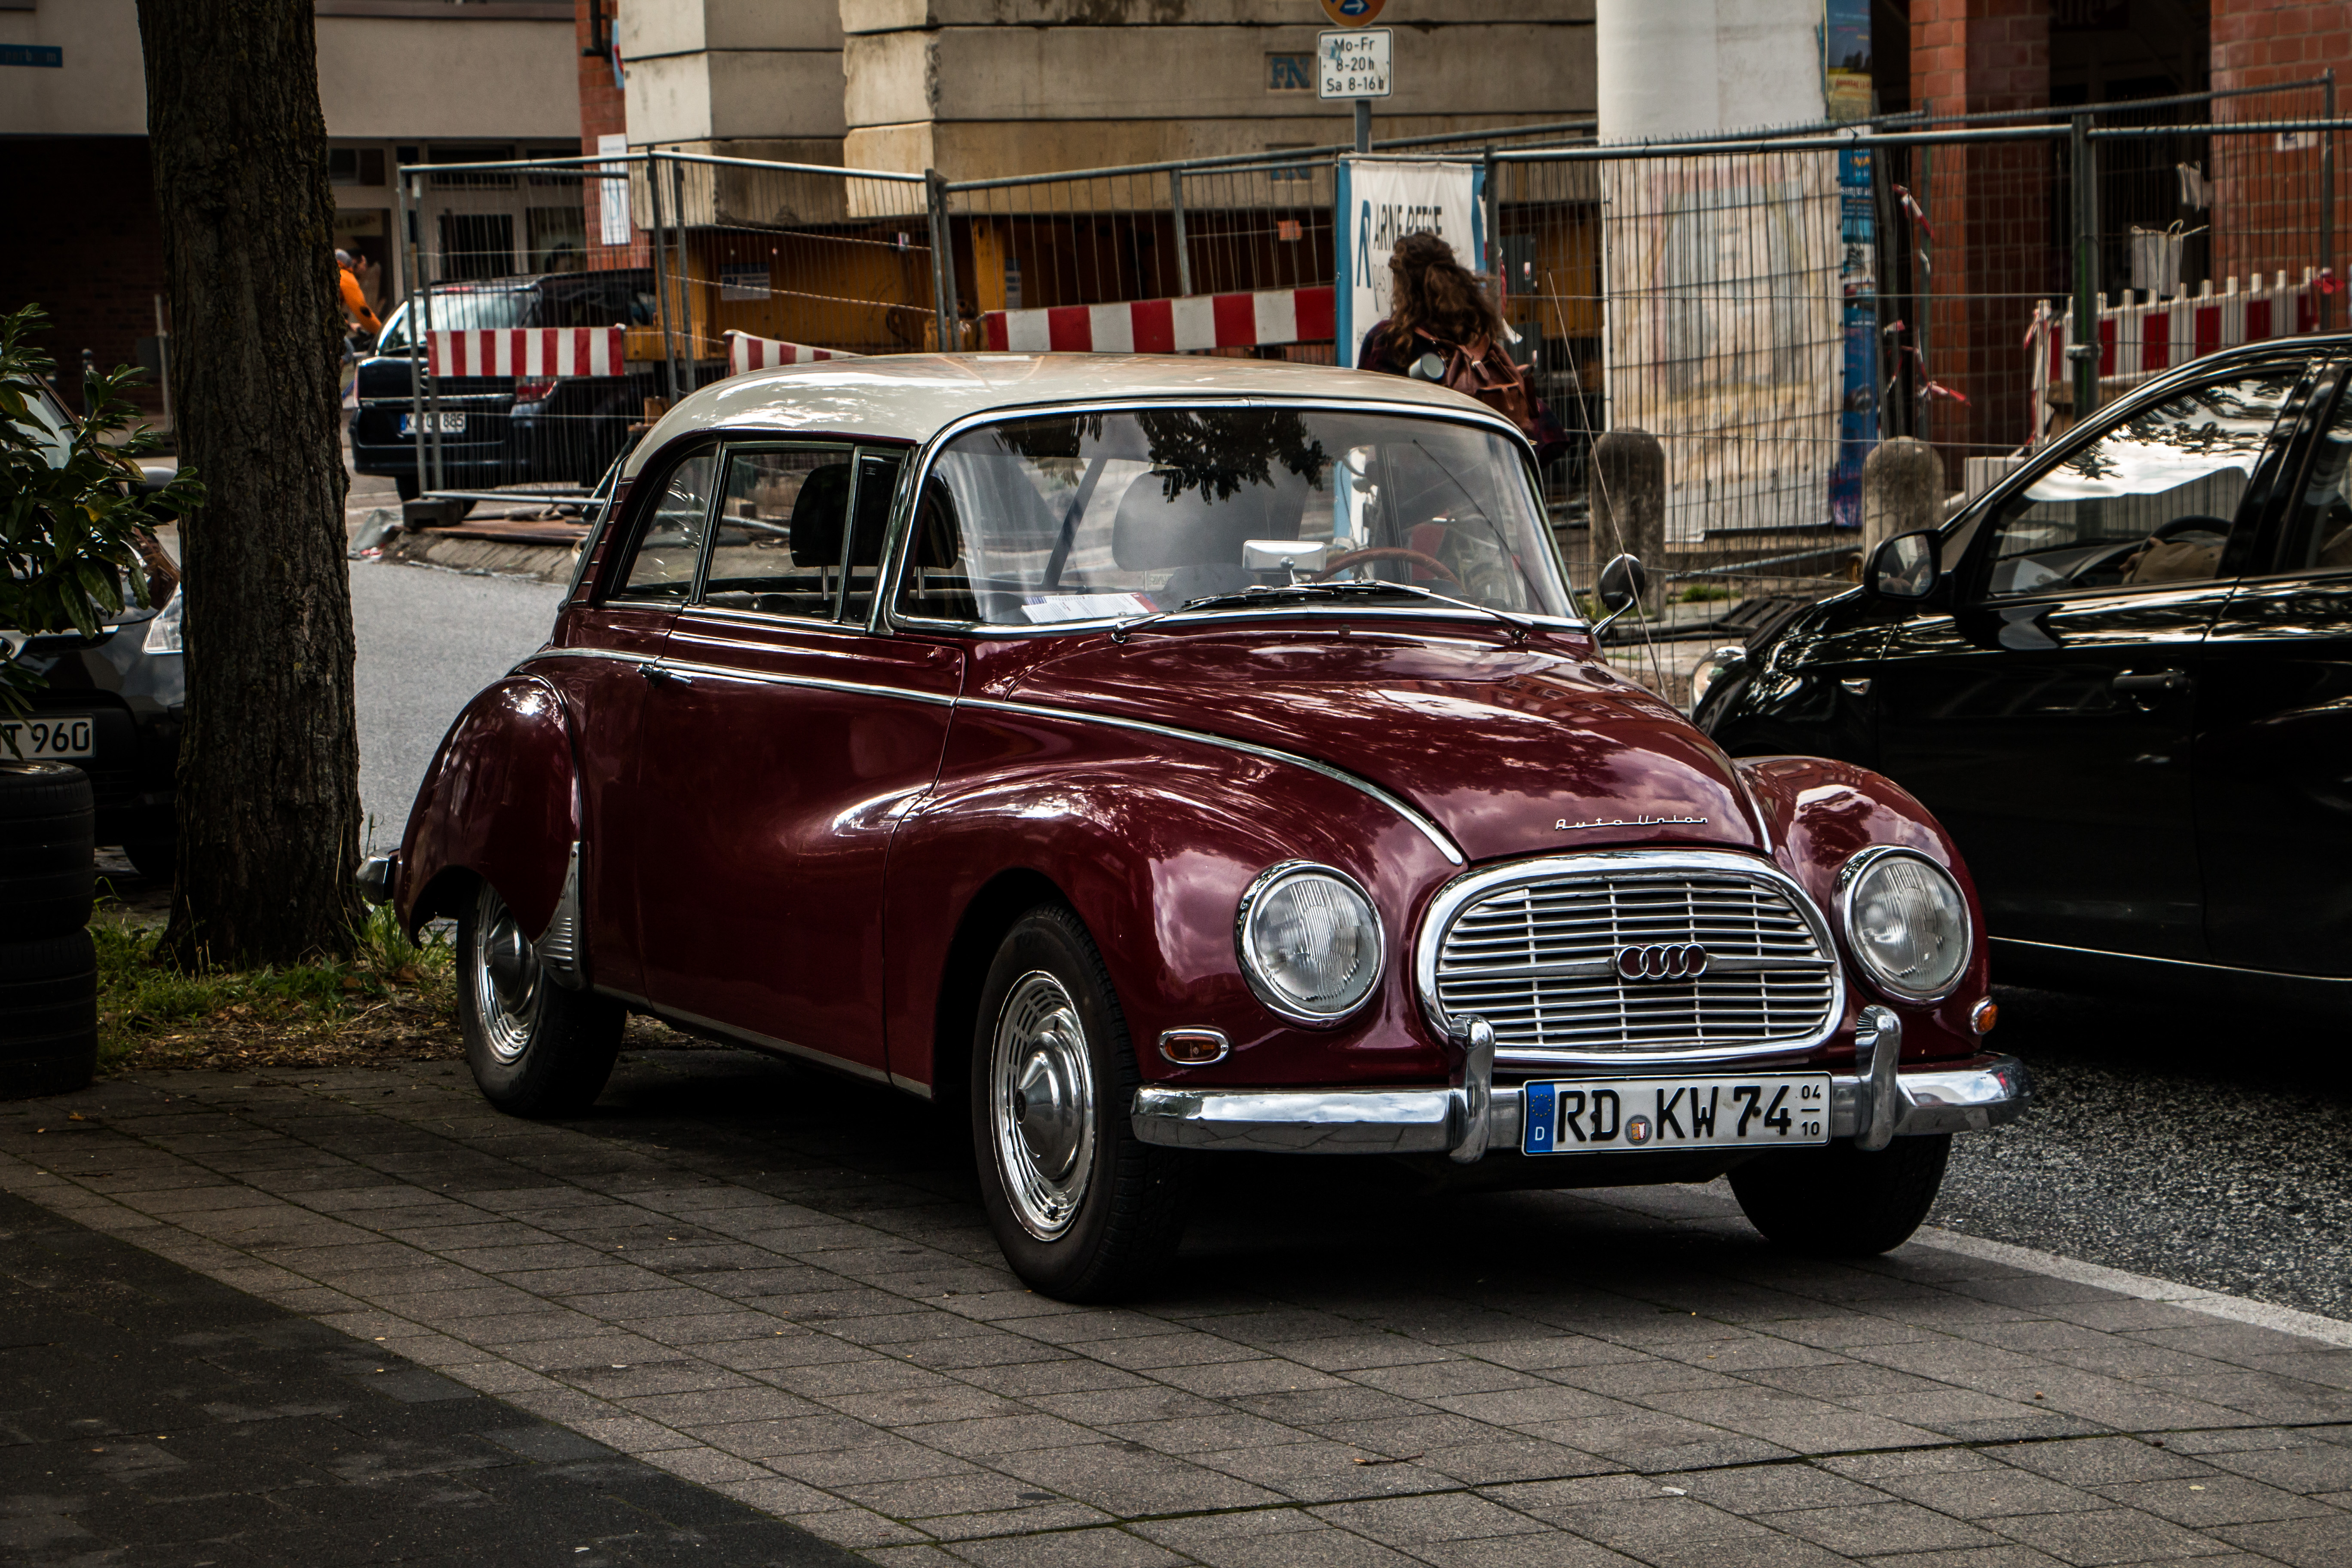 Retro Audi, Audi, Auto, Beautiful, Car, HQ Photo